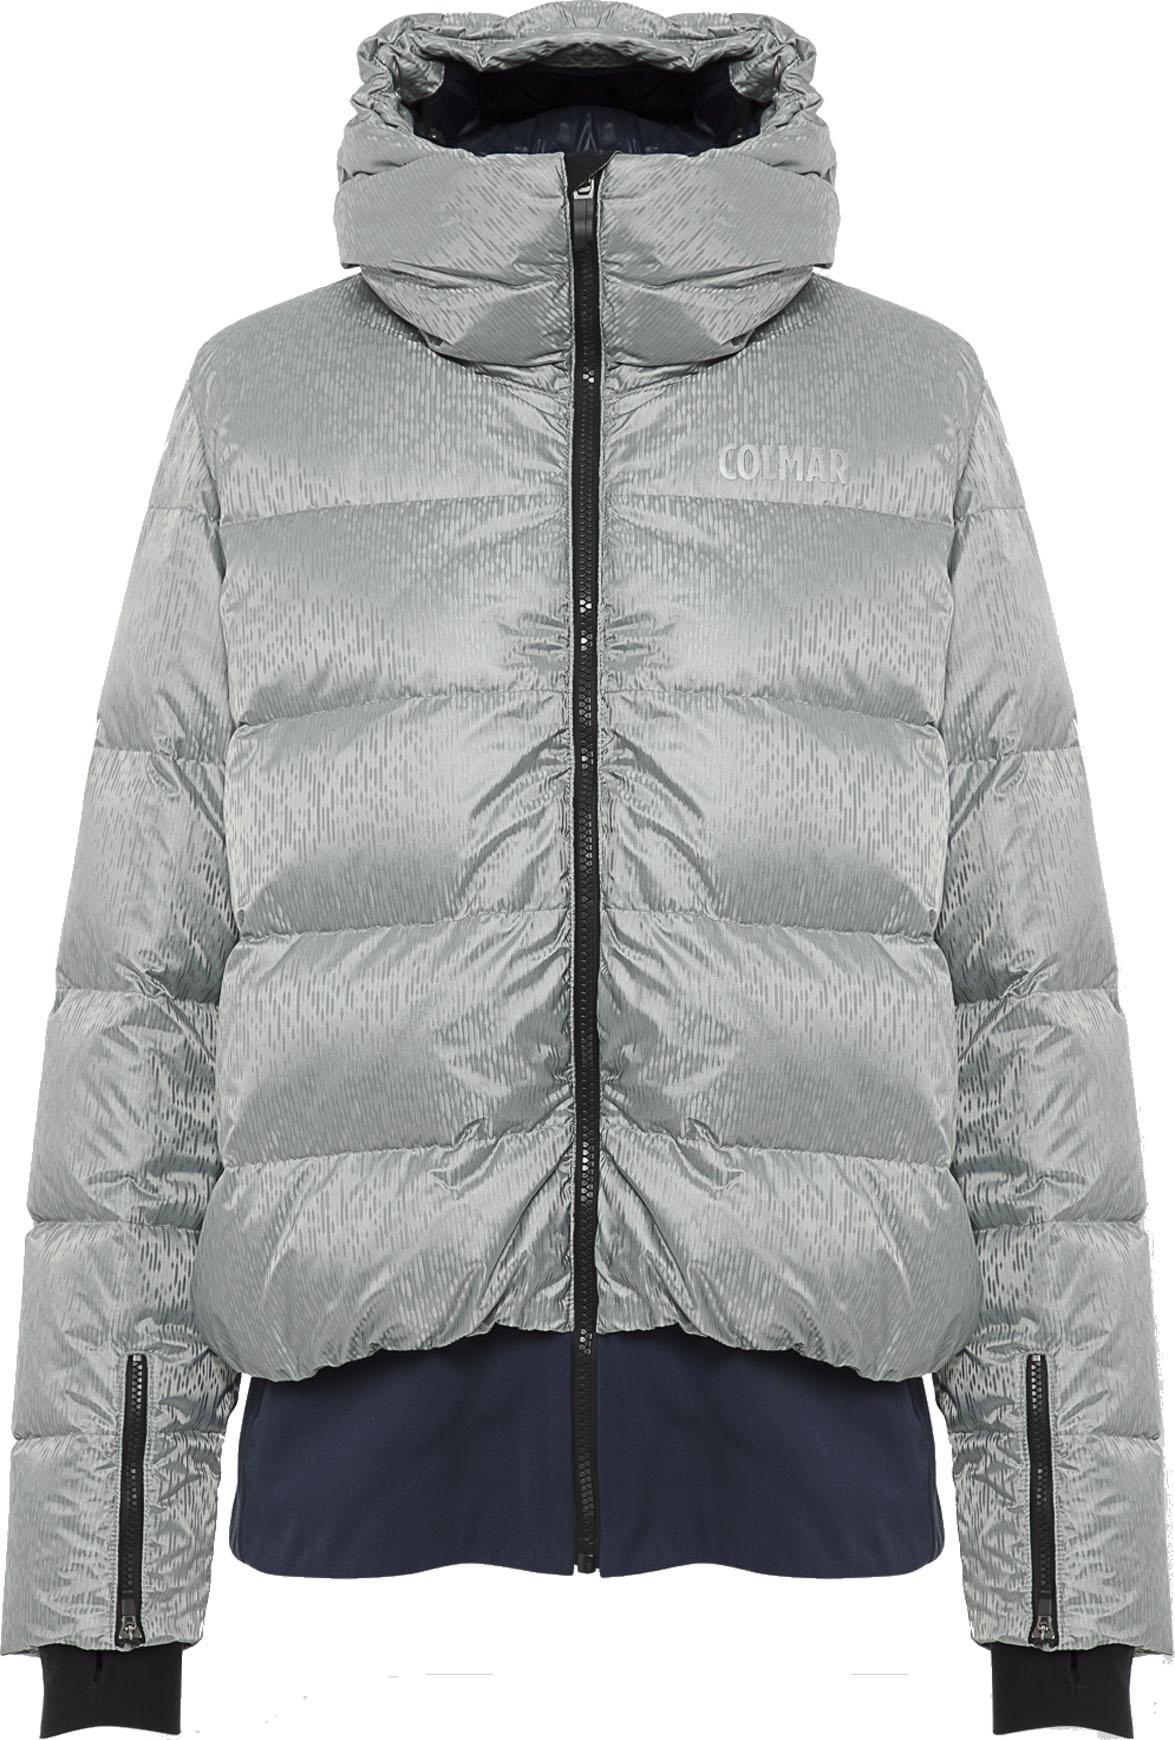 Ladies Down Ski Jacket Megève Greystone Blue Black